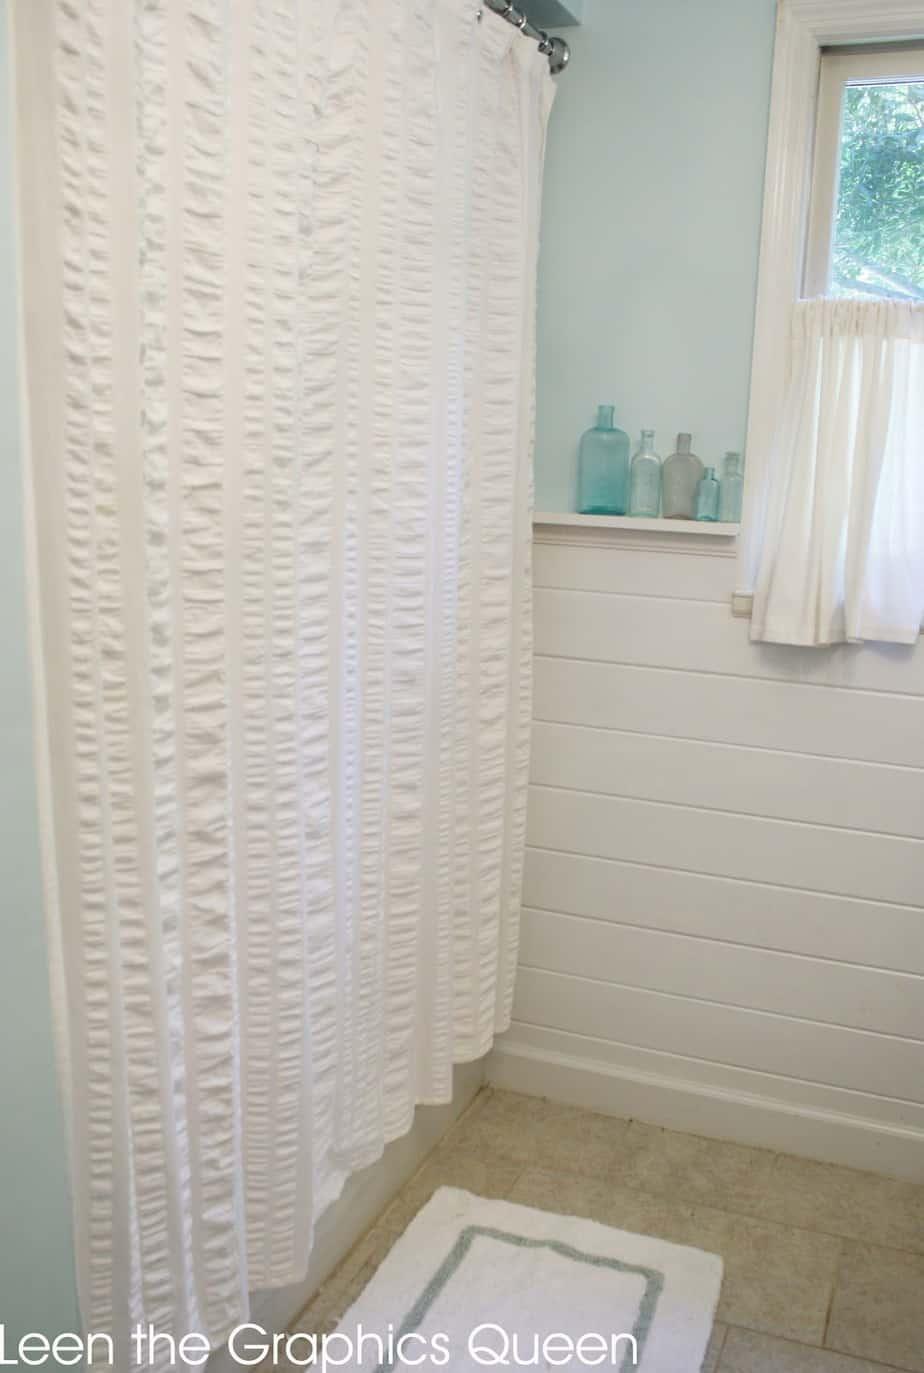 Sea Glass Inspired Coastal Bathroom Remodel - Sand Dollar Lane